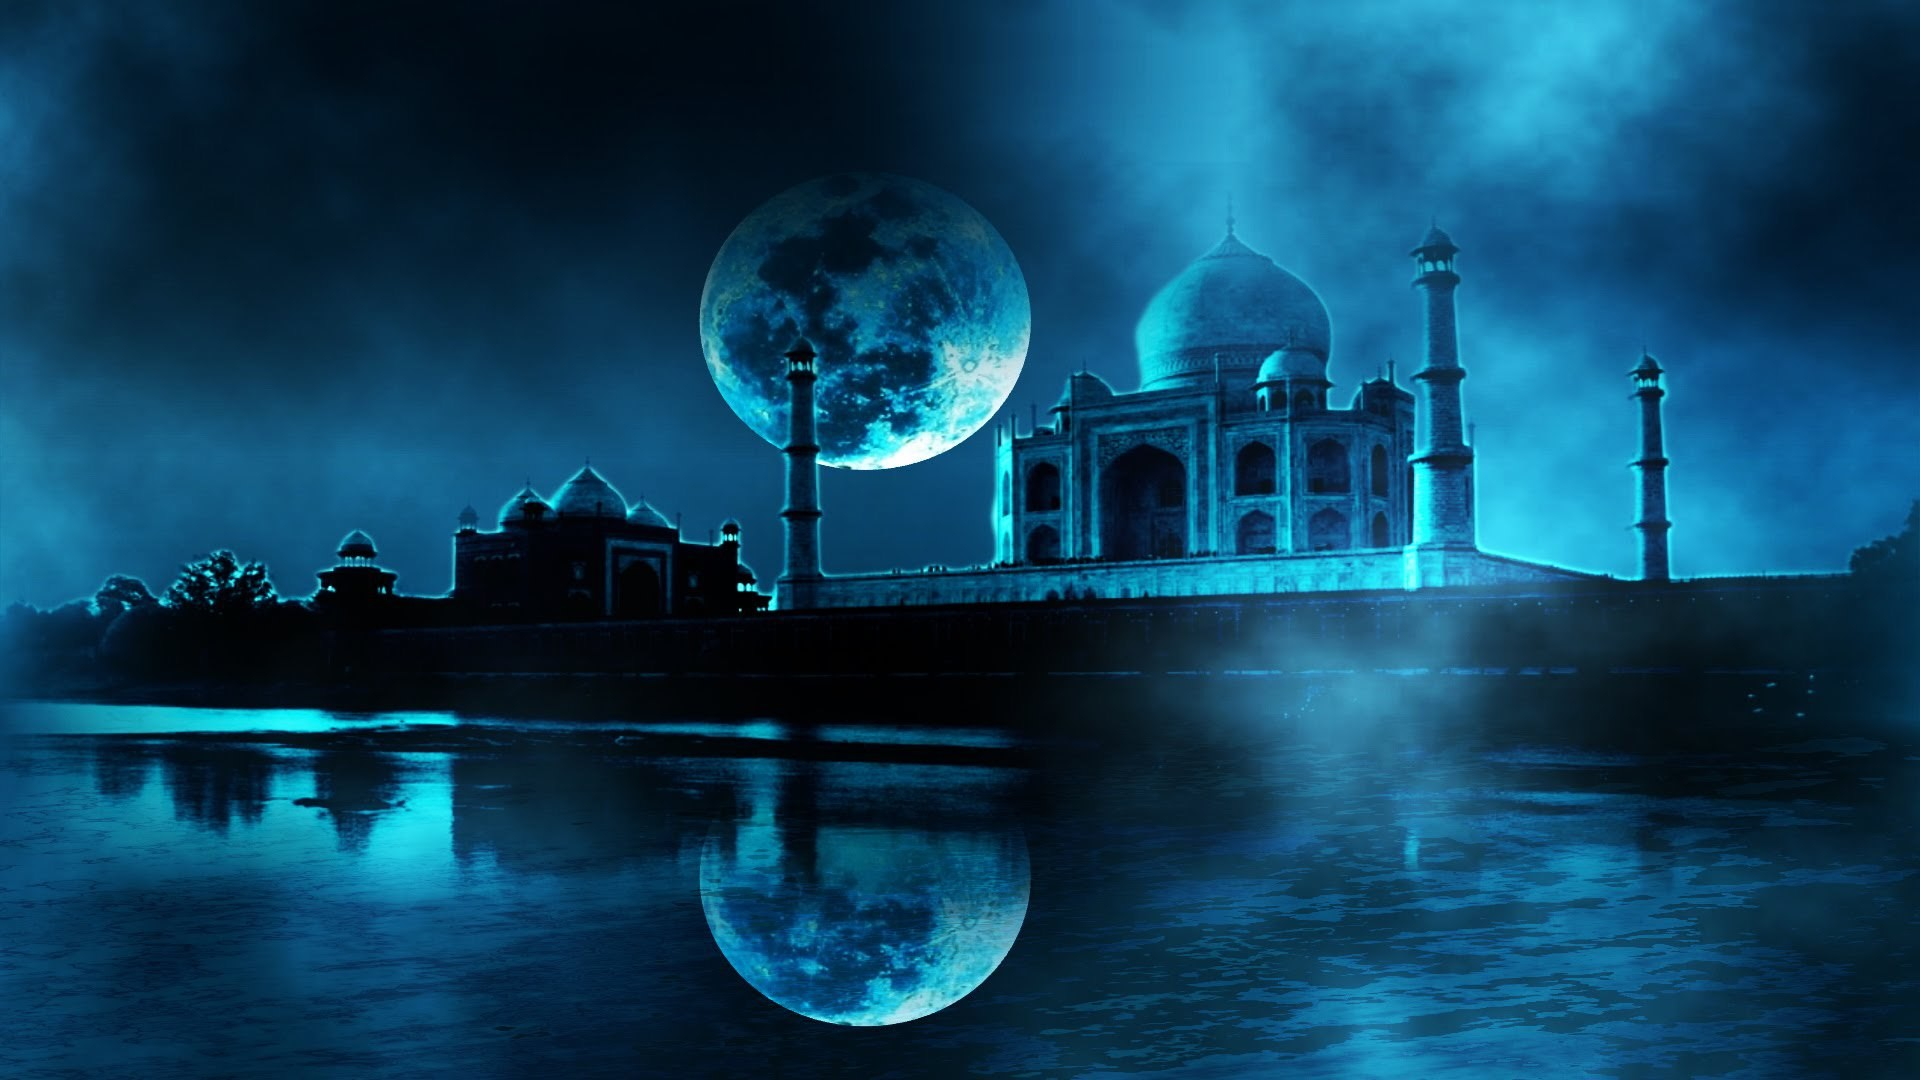 Green Wallpaper Iphone 5 Taj Mahal At Night Wallpaper 3d 183 ①